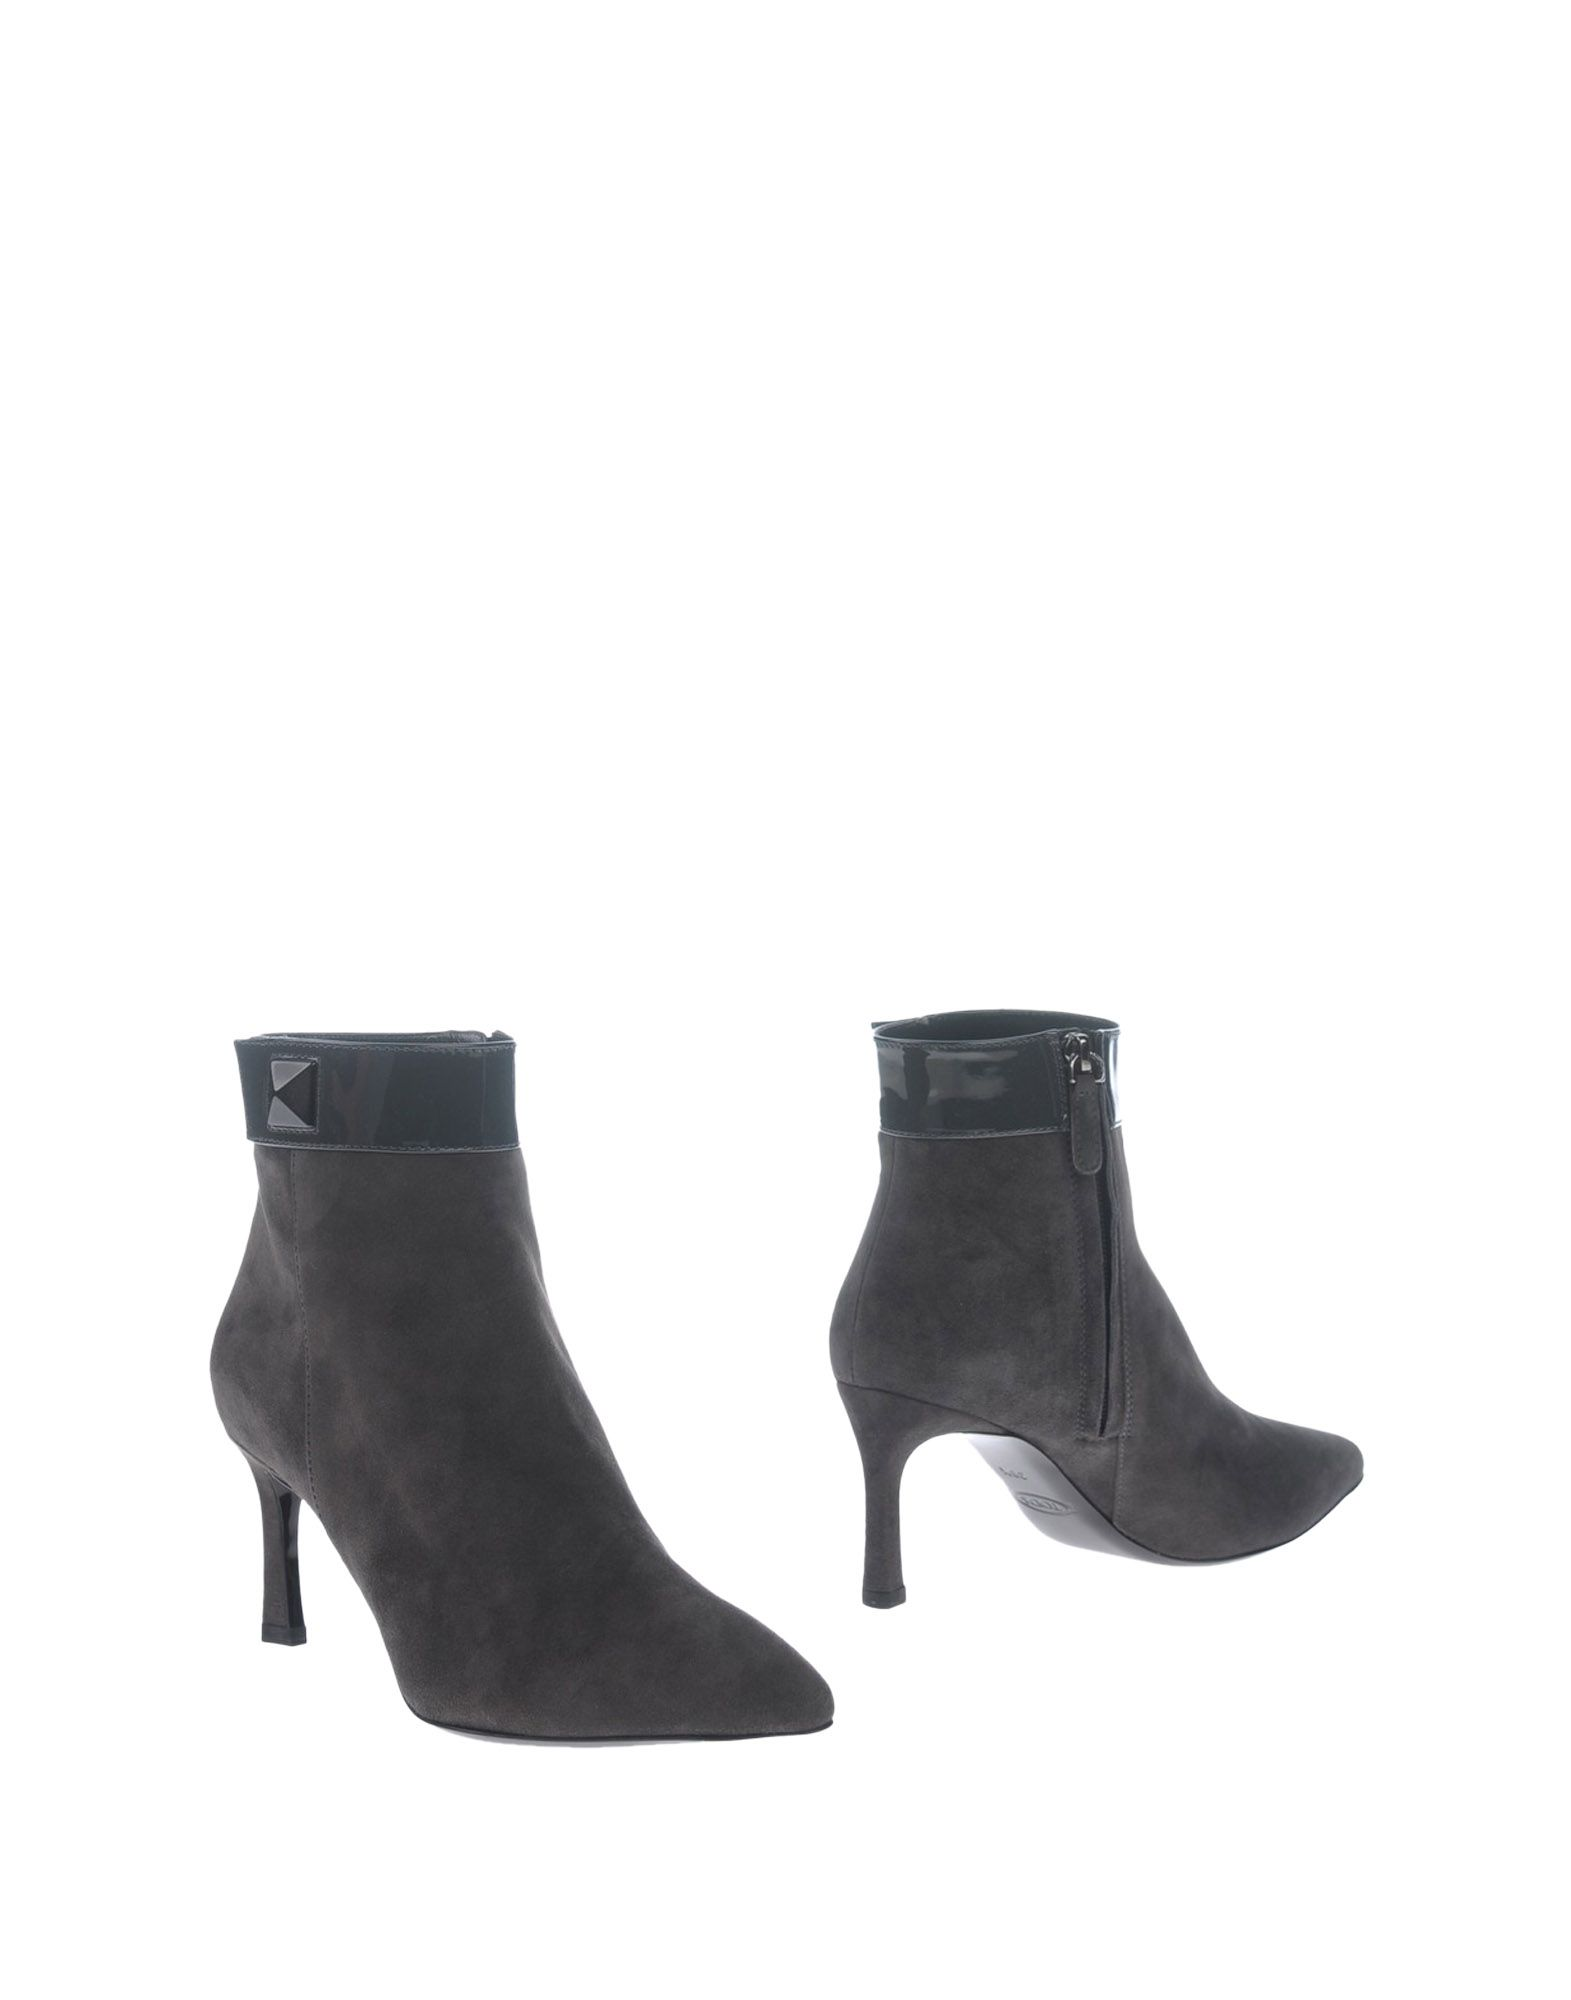 Moda Stivaletti Tod's Donna - 11070920UW